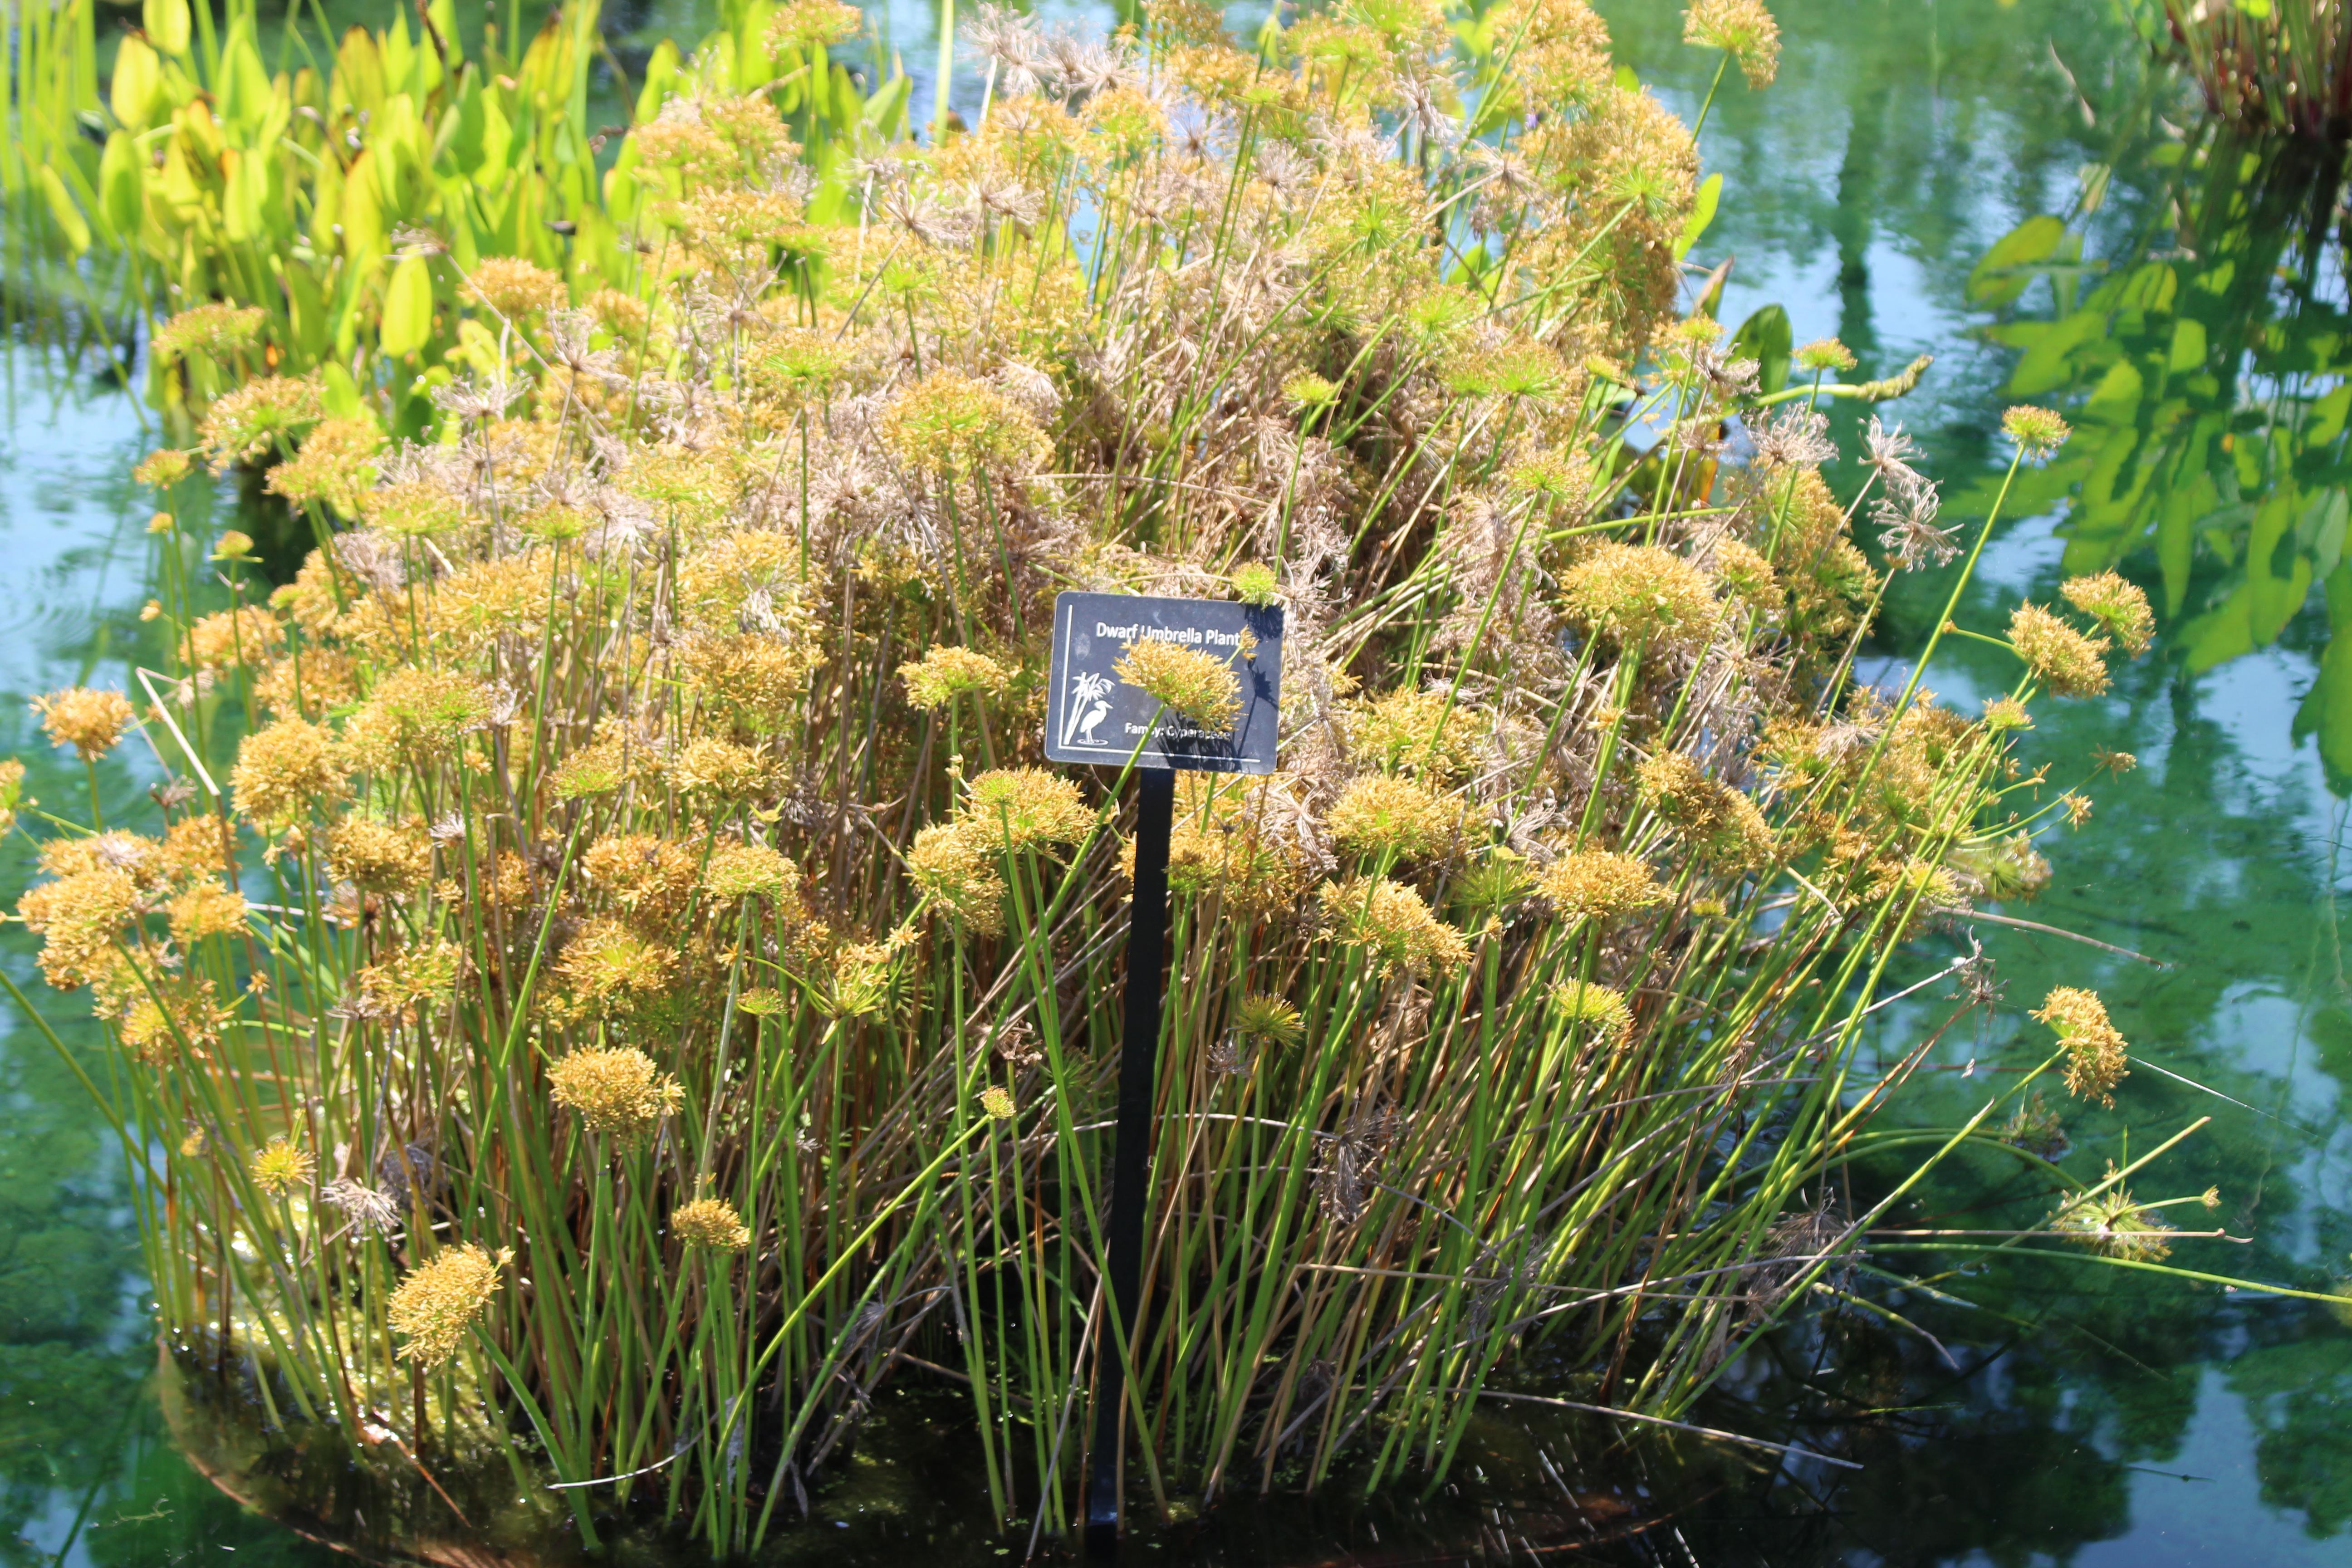 File:Coastal Georgia Botanical Gardens, Dwarf Umbrella Plant